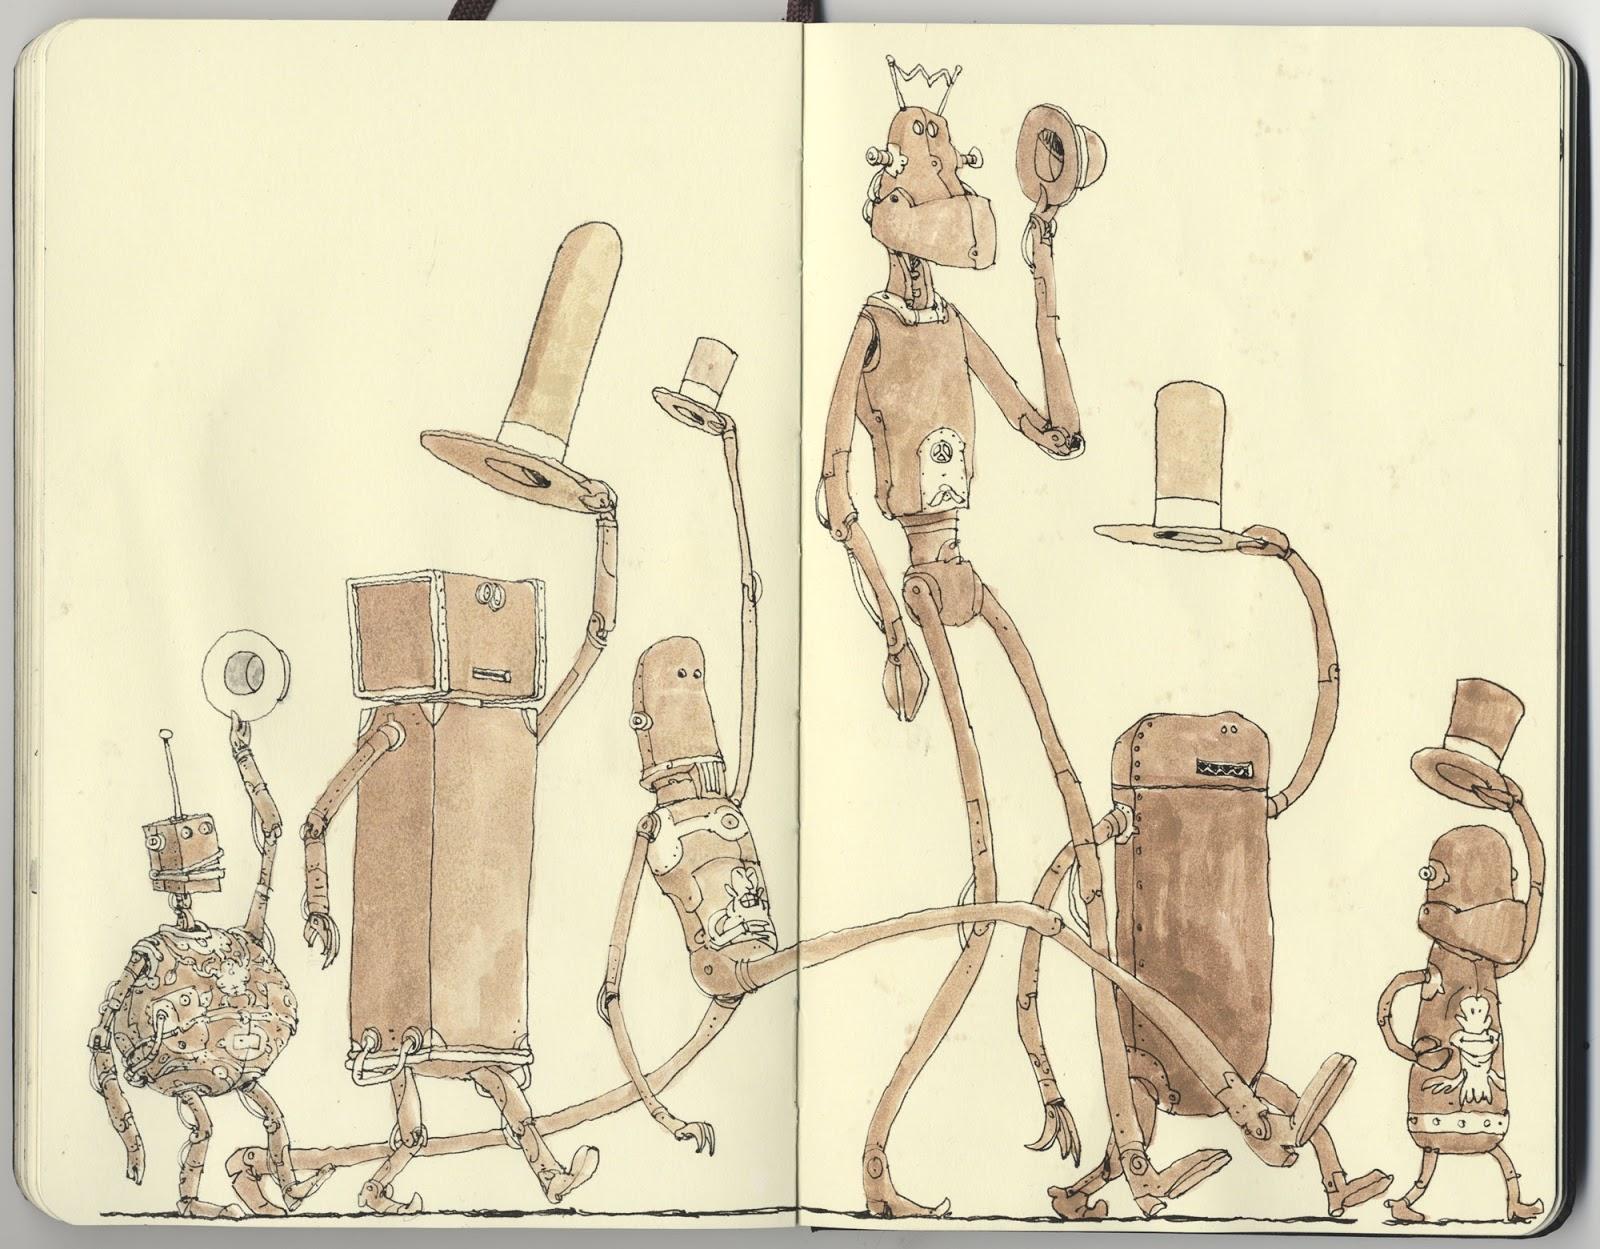 Mattias Adolfsson sketch illustration 8